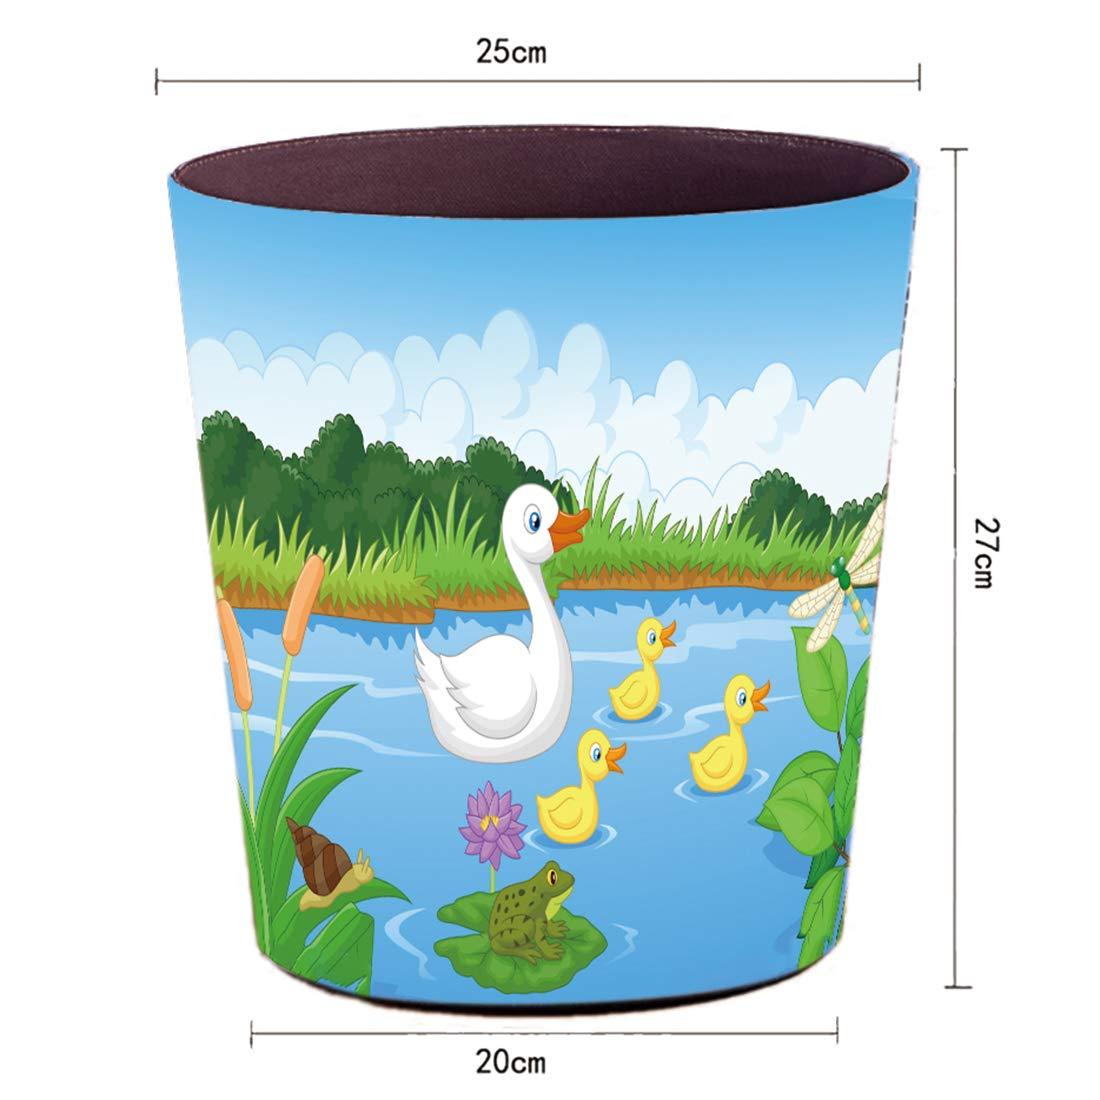 27x25x20 cm 10L Impermeable Papelera Infantil Cubo de Basura Basurero para Oficina Habitacion Cocina Yavso Papeleras Habitacion